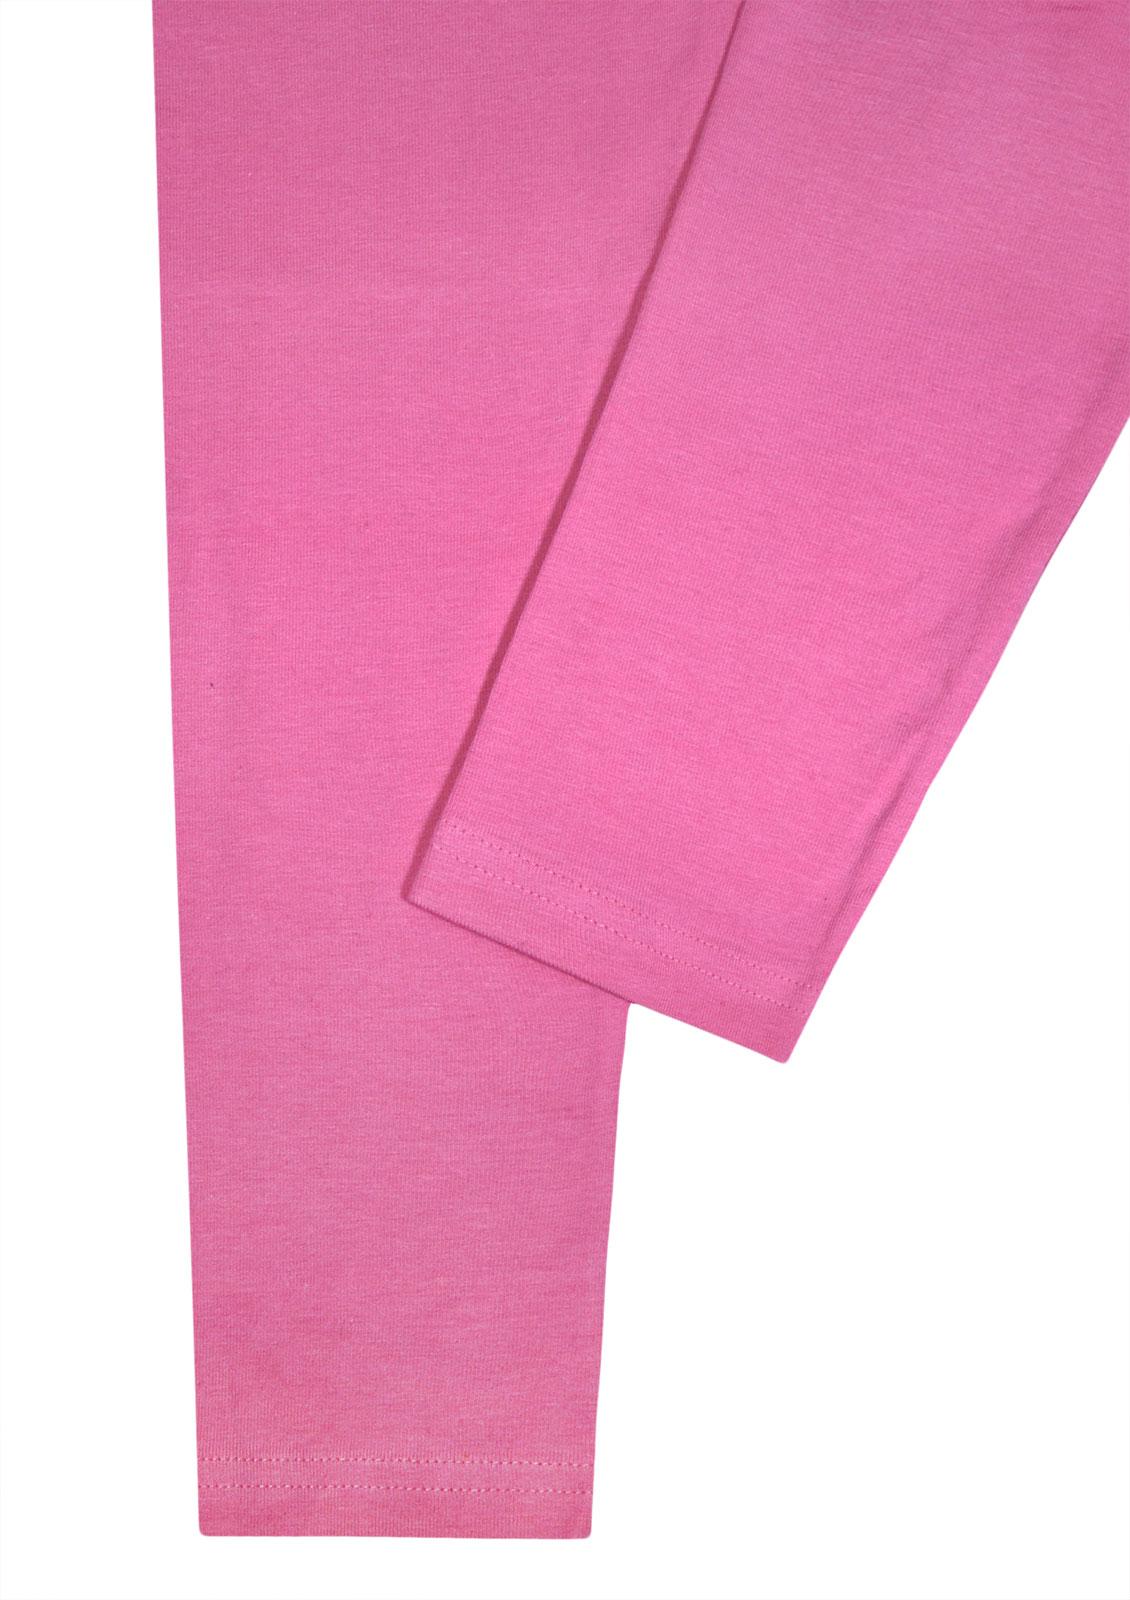 Girls-Next-Leggings-Kids-New-Pants-Age-2-3-4-5-6-7-8-9-10-11-12-13-14-15-16-Yrs thumbnail 8